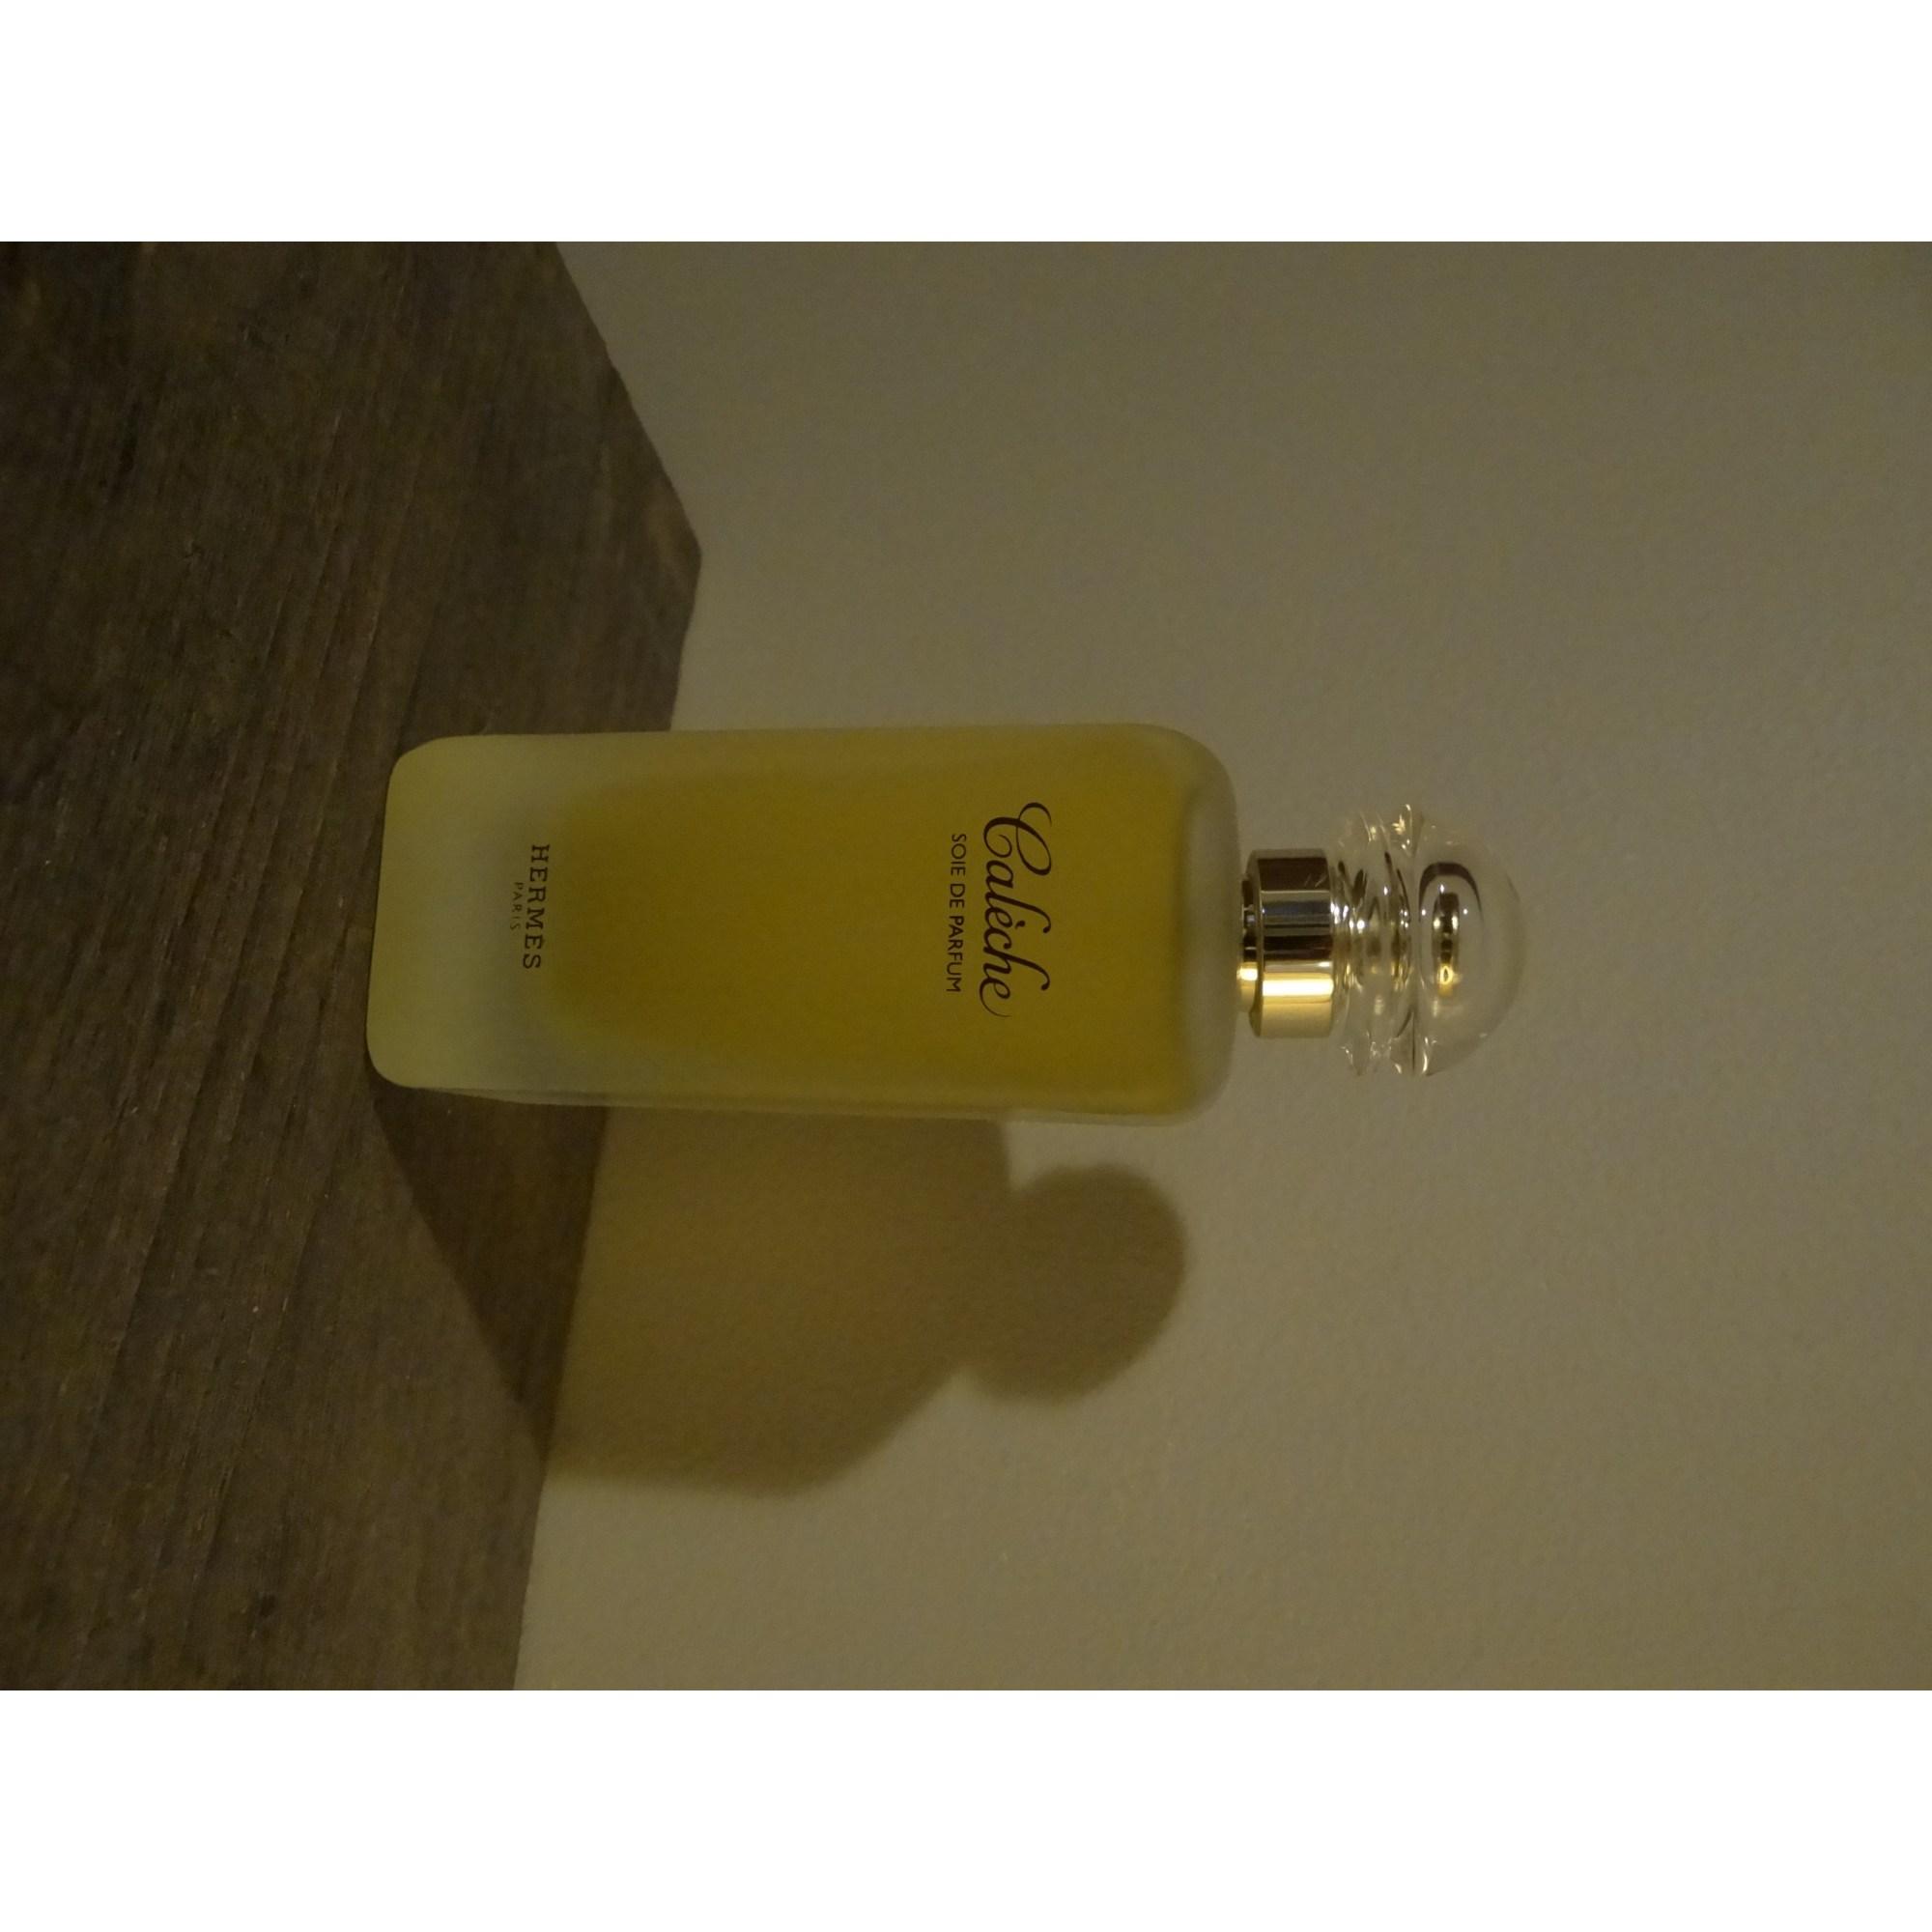 Par Hermès Charlotte Parfum De 1410269 Gyfyb76 555 Eau Vendu wv0N8nm